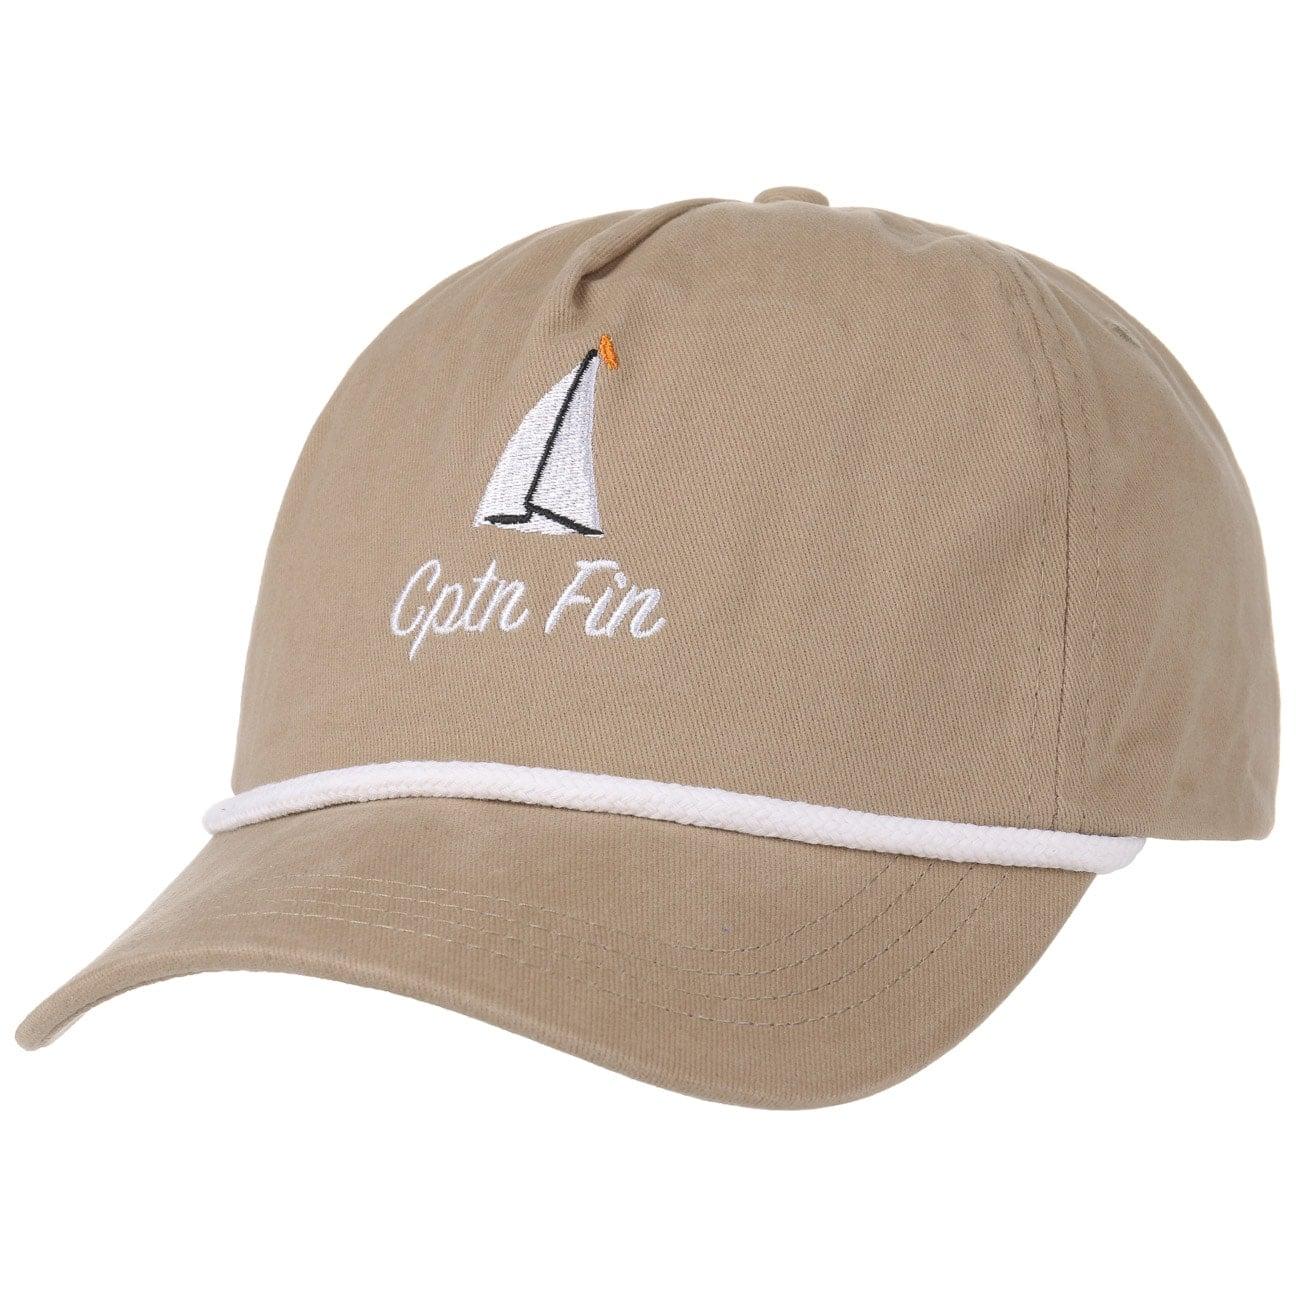 Casquette Snapback Sailor by Captain Fin  baseball cap